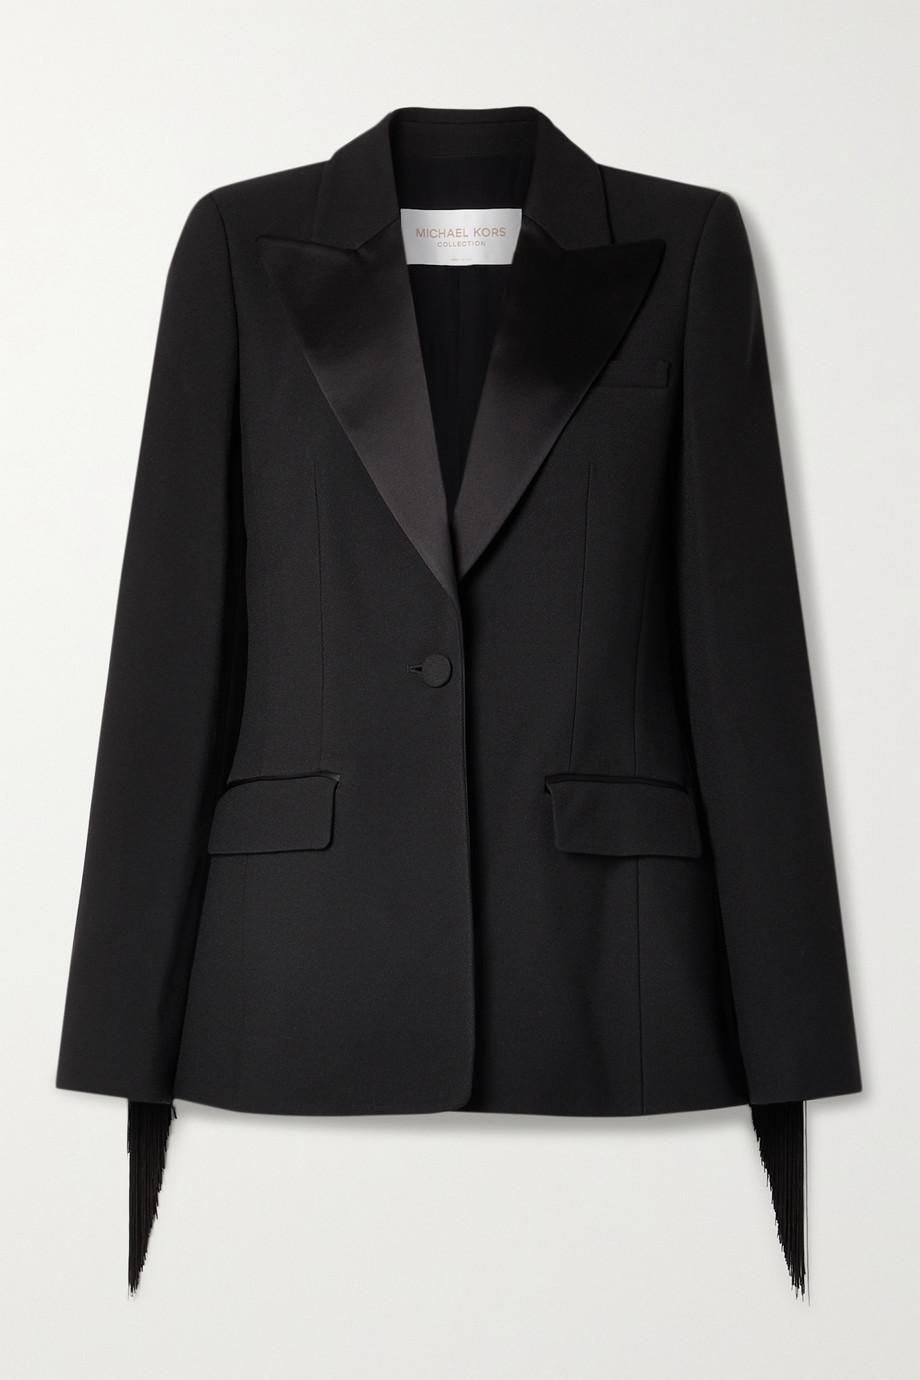 Michael Kors Collection Satin-trimmed fringed crepe blazer